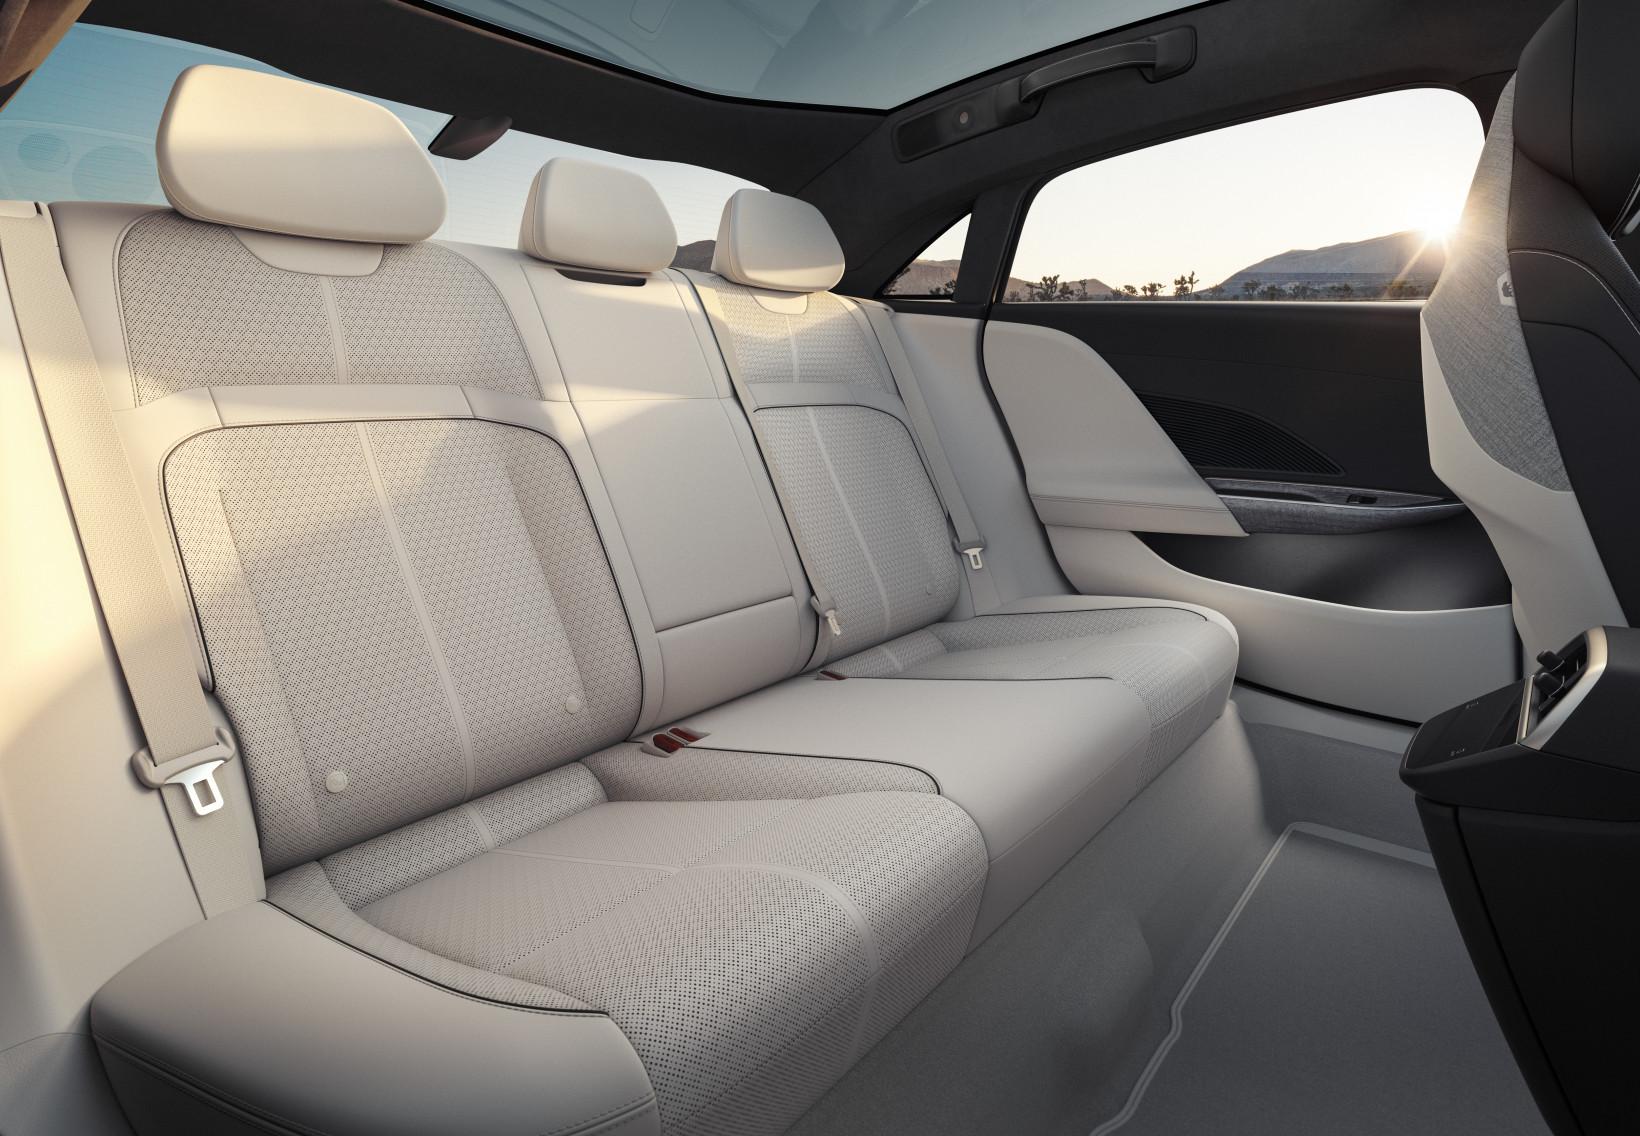 interior, seats, passengers